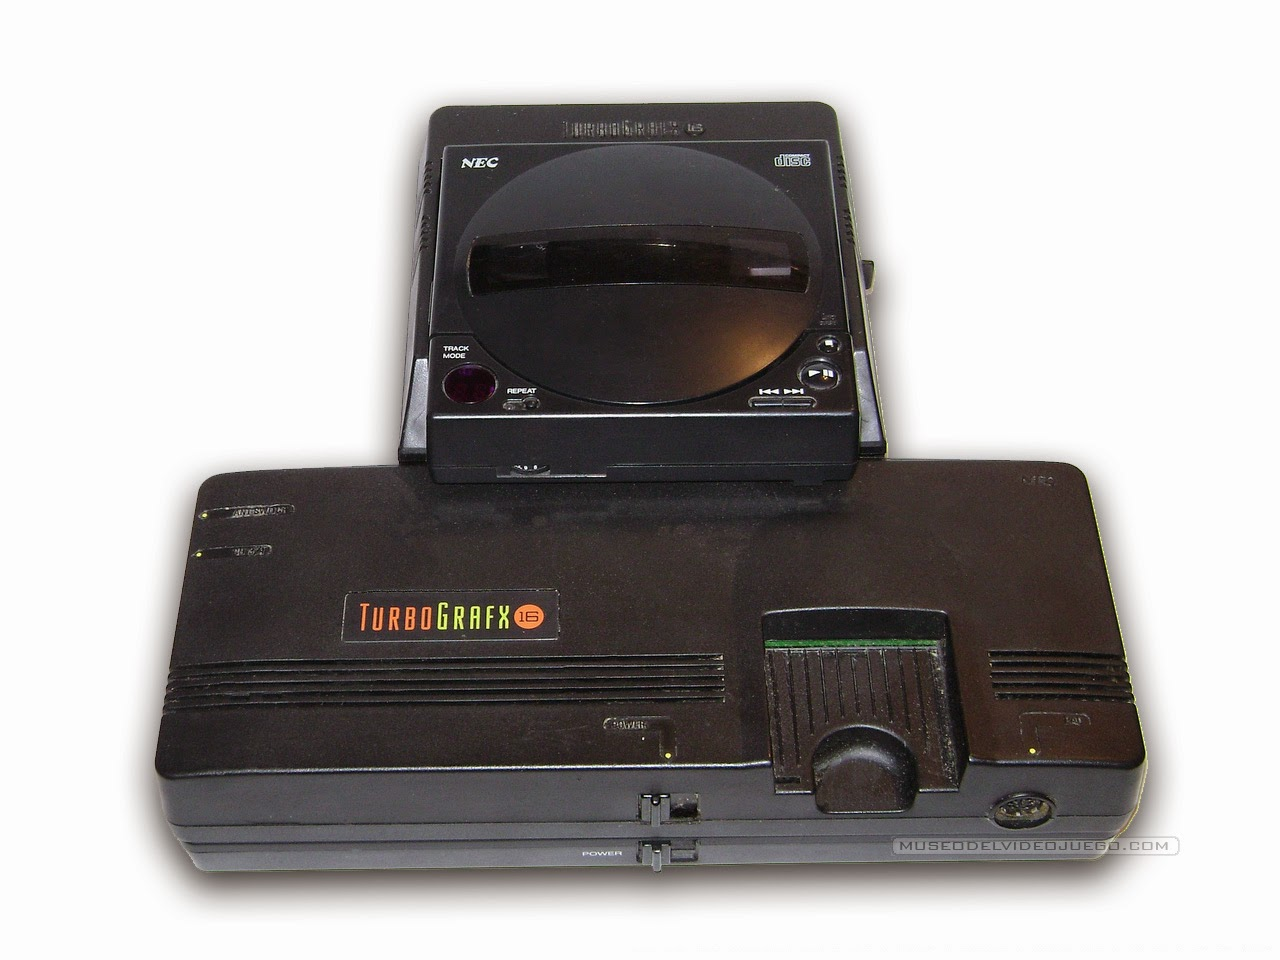 NEC-Turbografx-CD.jpg